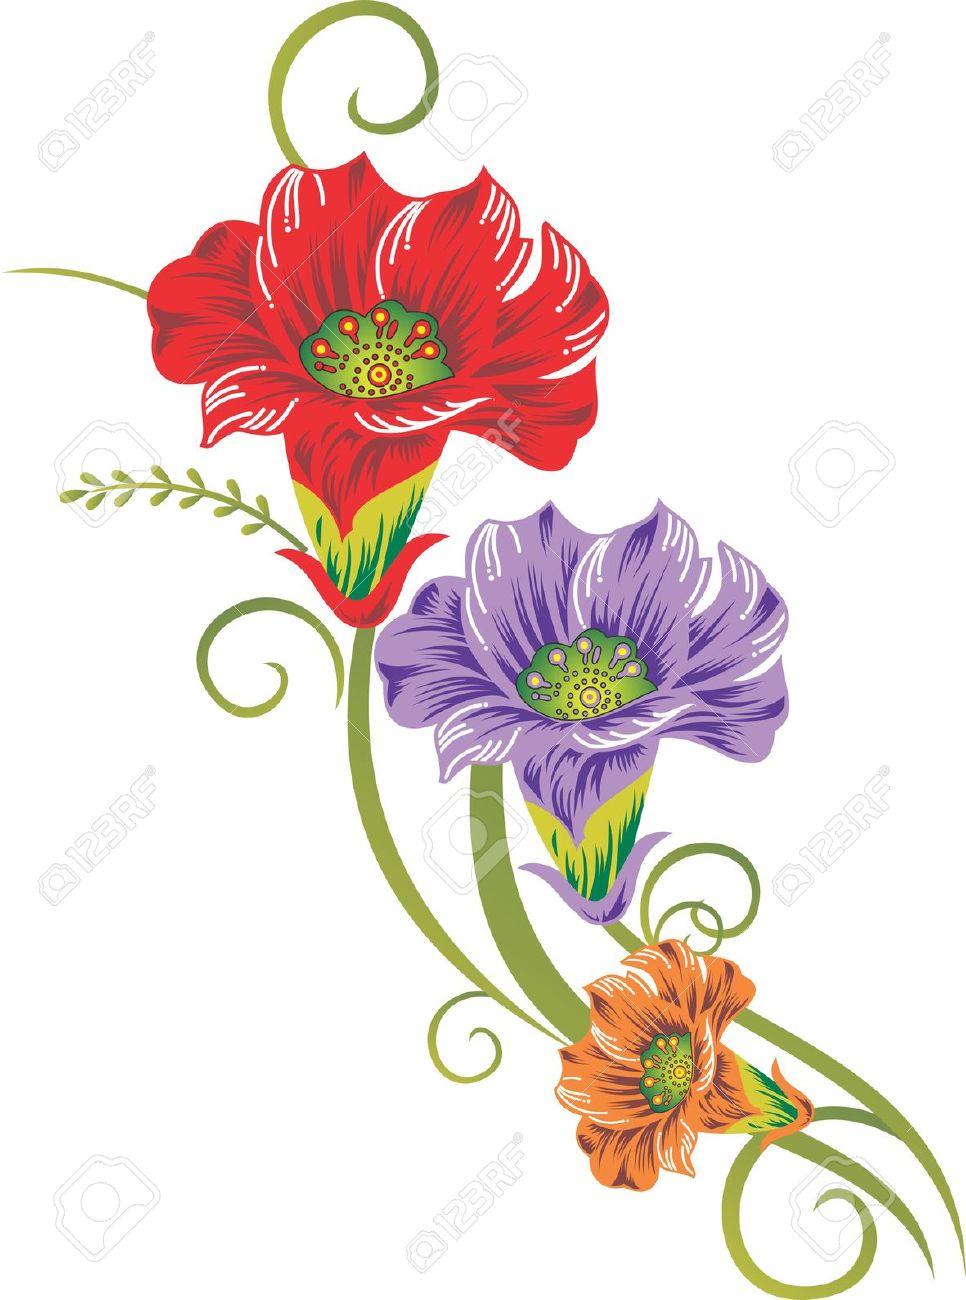 Art images of flowers. Flower pics clipartfest stock